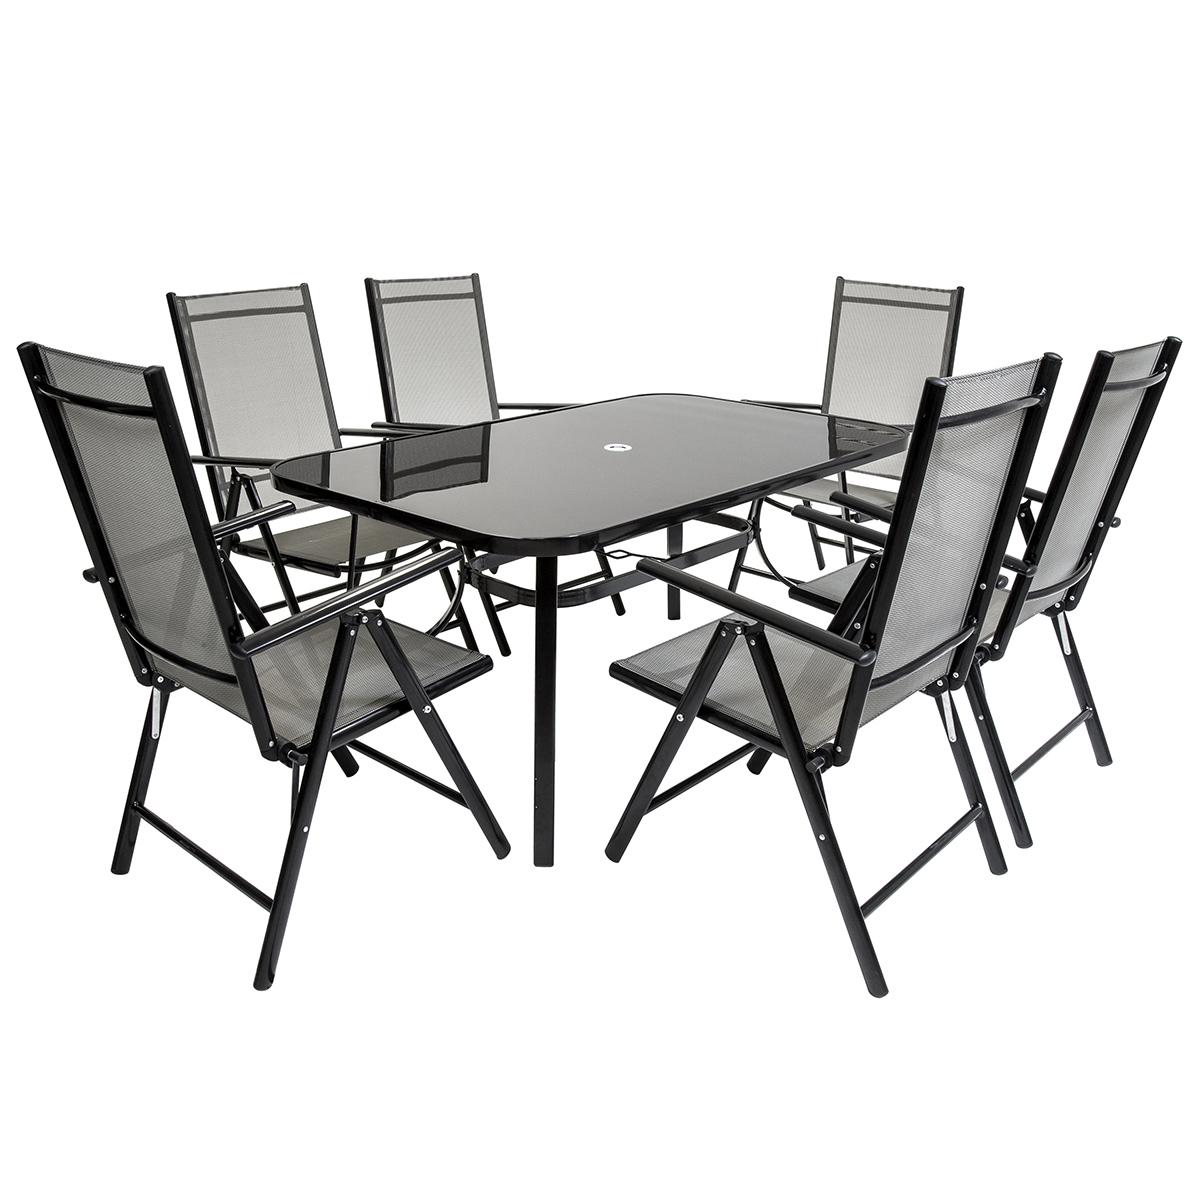 6 Seater Rectangular Textilene Table Seats Garden Set Black Rattan Furniture Patio Conservatory